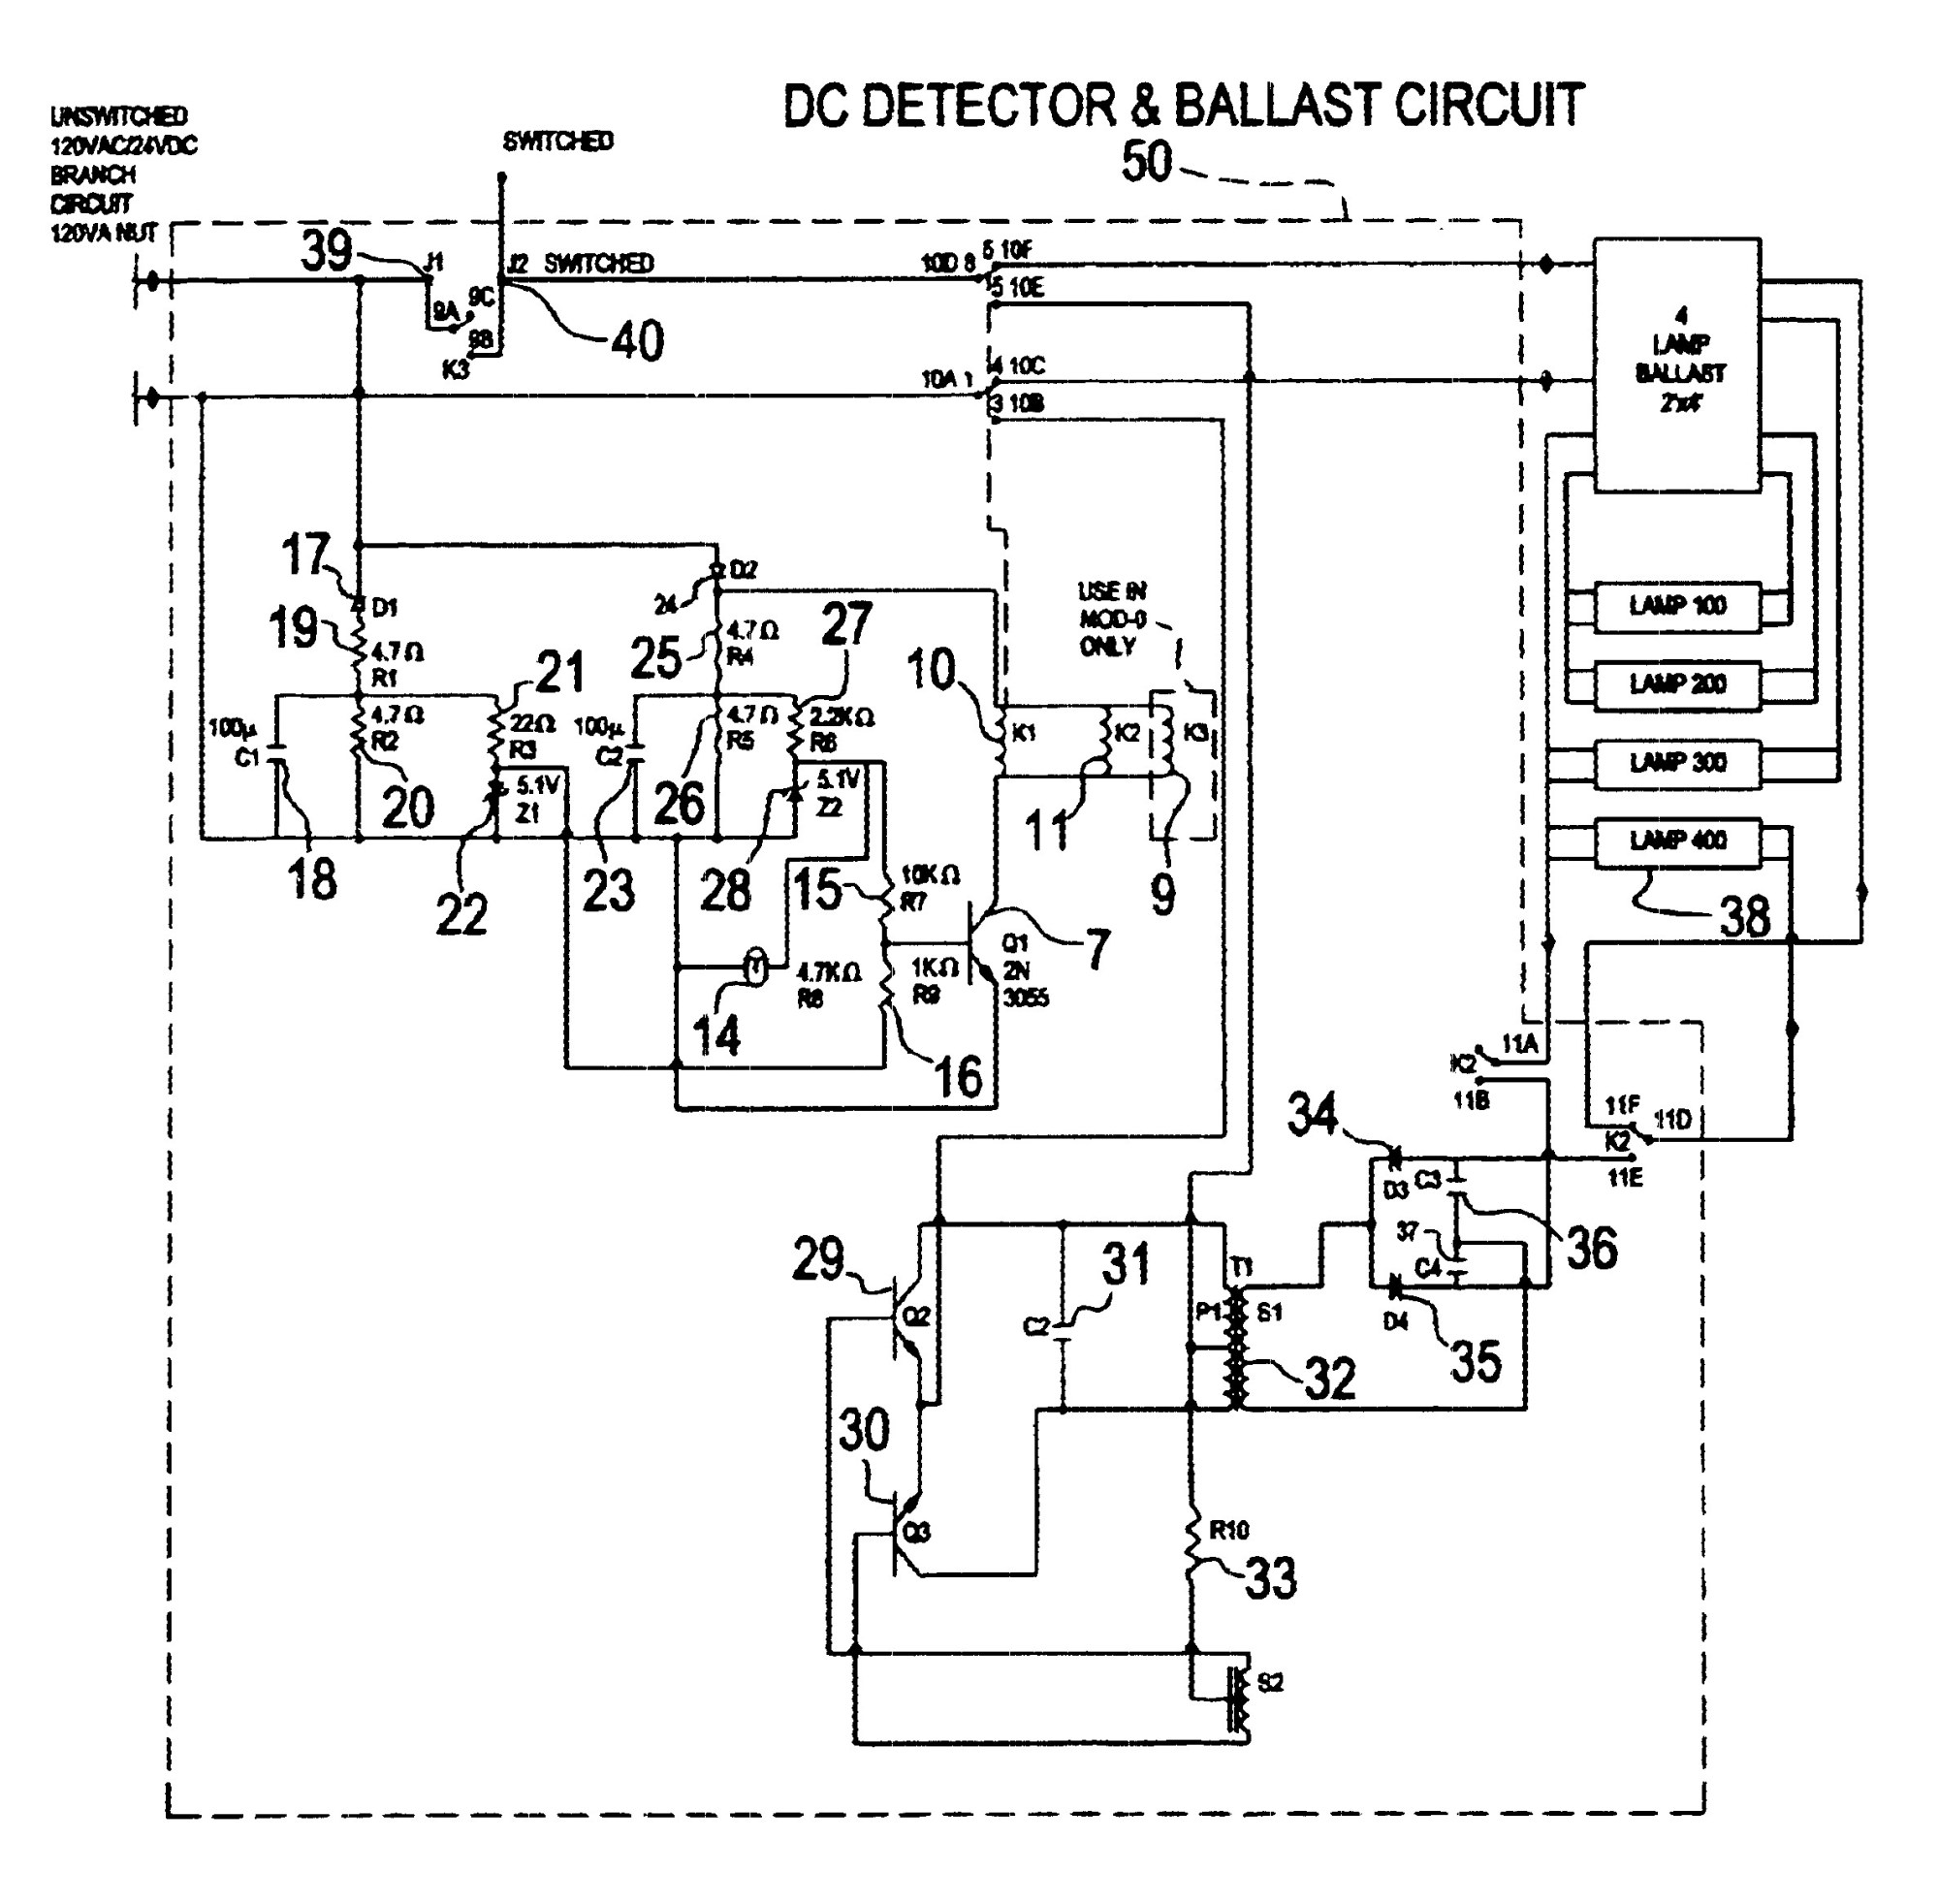 hight resolution of  bodine emergency ballast wiring diagram enchanting bodine b100 wiring diagram elaboration electrical philips